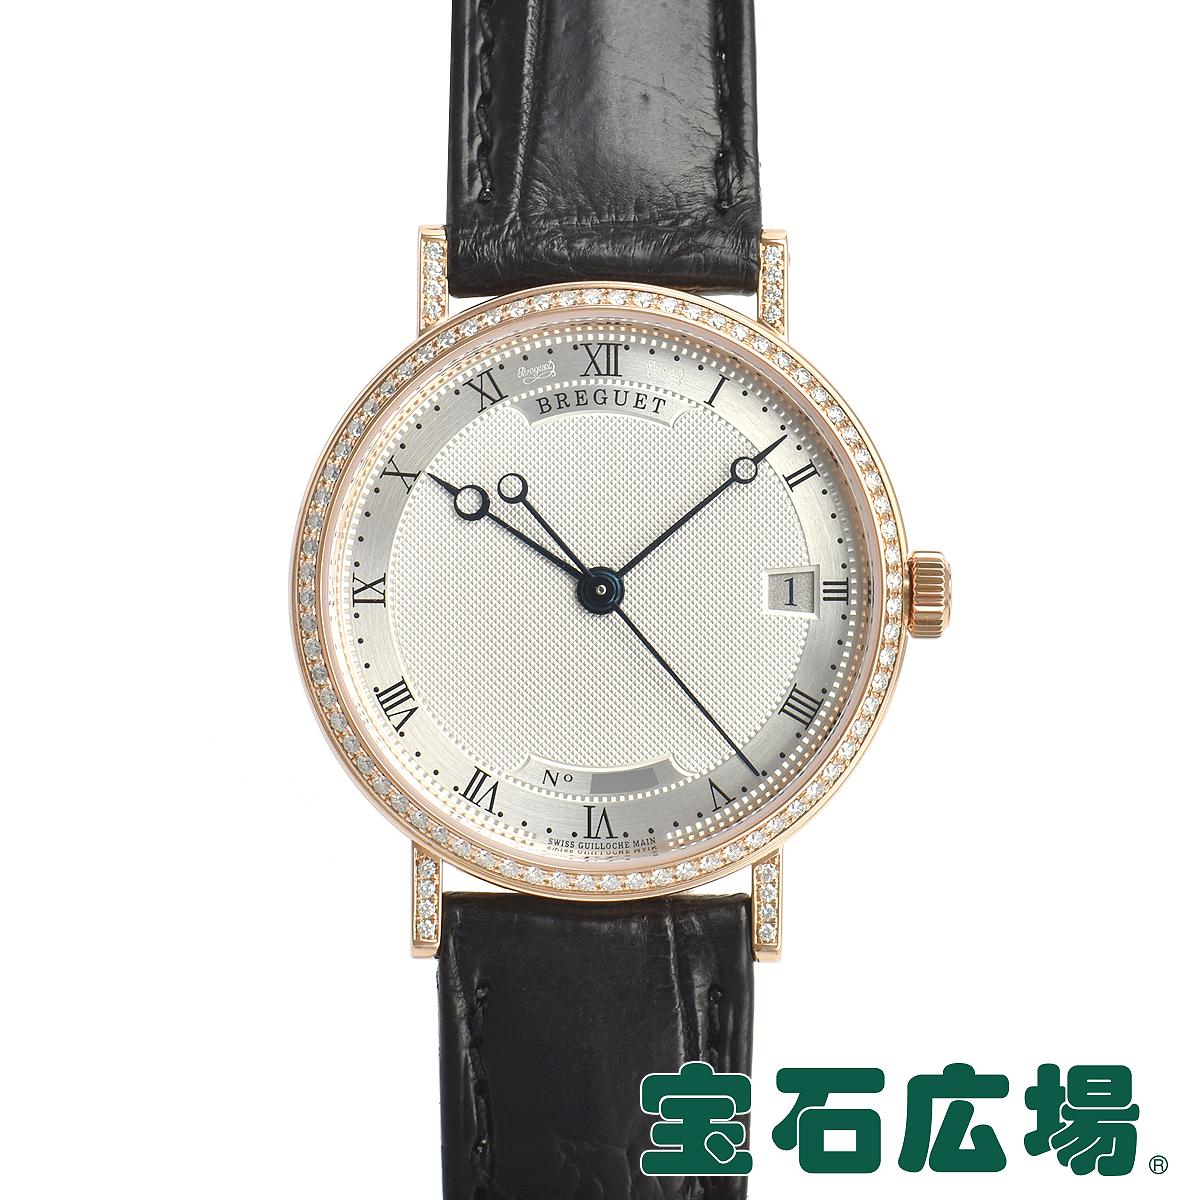 【GINGER掲載商品】 ブレゲ BREGUET クラシック 9068BR/12/976 クラシック DD00【 腕時計】メンズ BREGUET 腕時計 送料無料, ふとん工場サカイ:5d63ba88 --- amga360.amga-dusch.ru